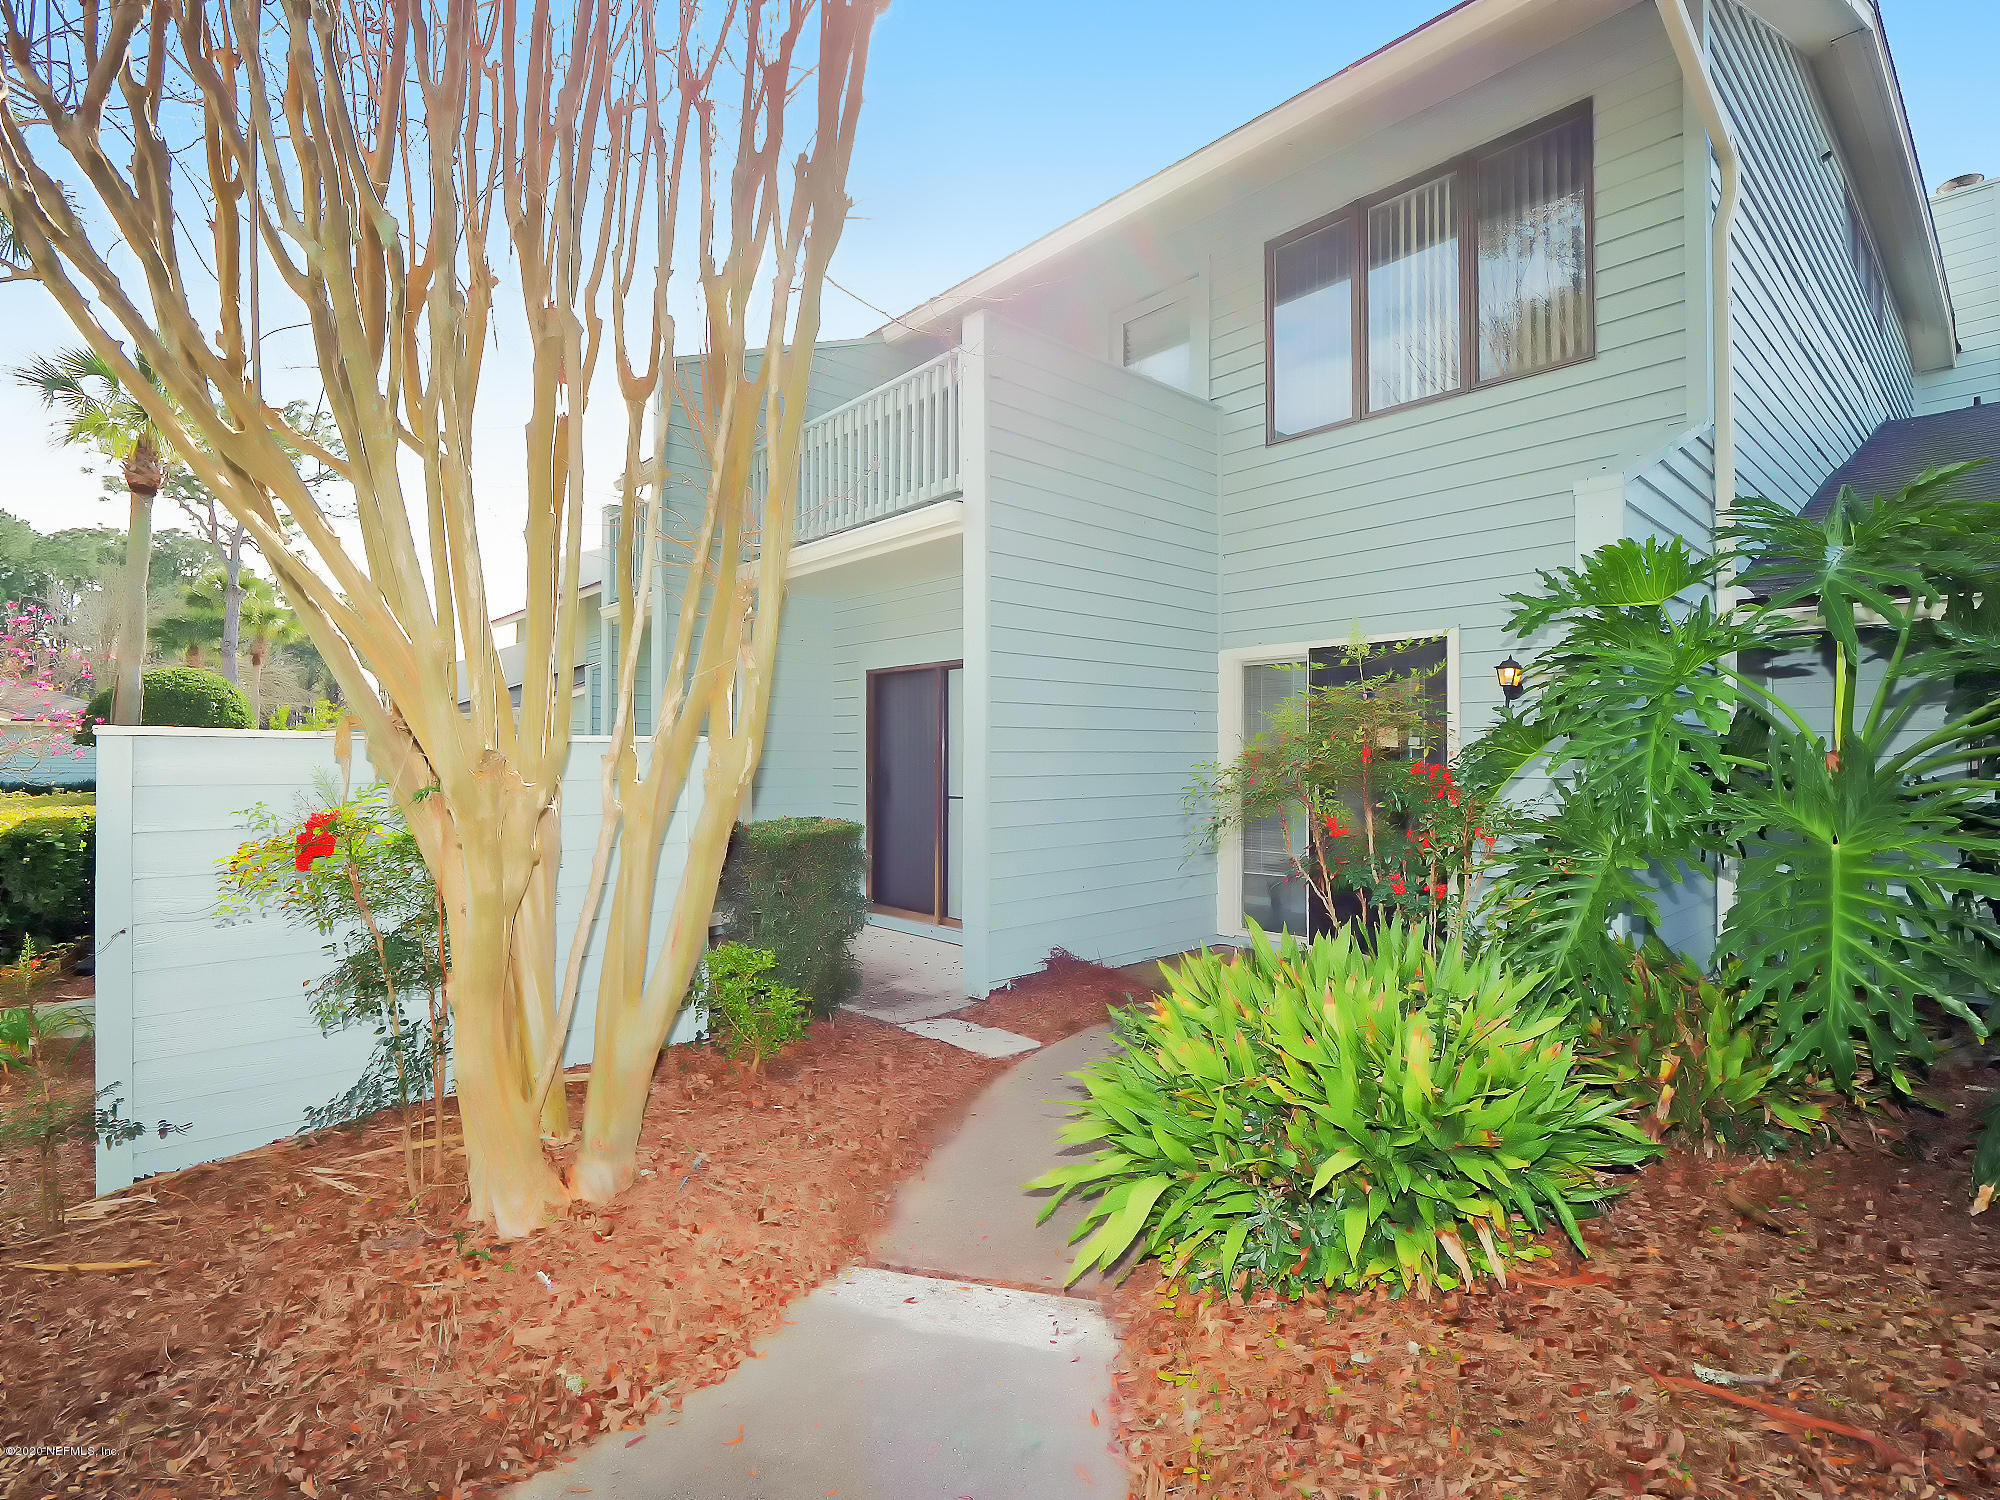 32 LITTLE BAY HARBOR, PONTE VEDRA BEACH, FLORIDA 32082, 2 Bedrooms Bedrooms, ,2 BathroomsBathrooms,Residential,For sale,LITTLE BAY HARBOR,1040359